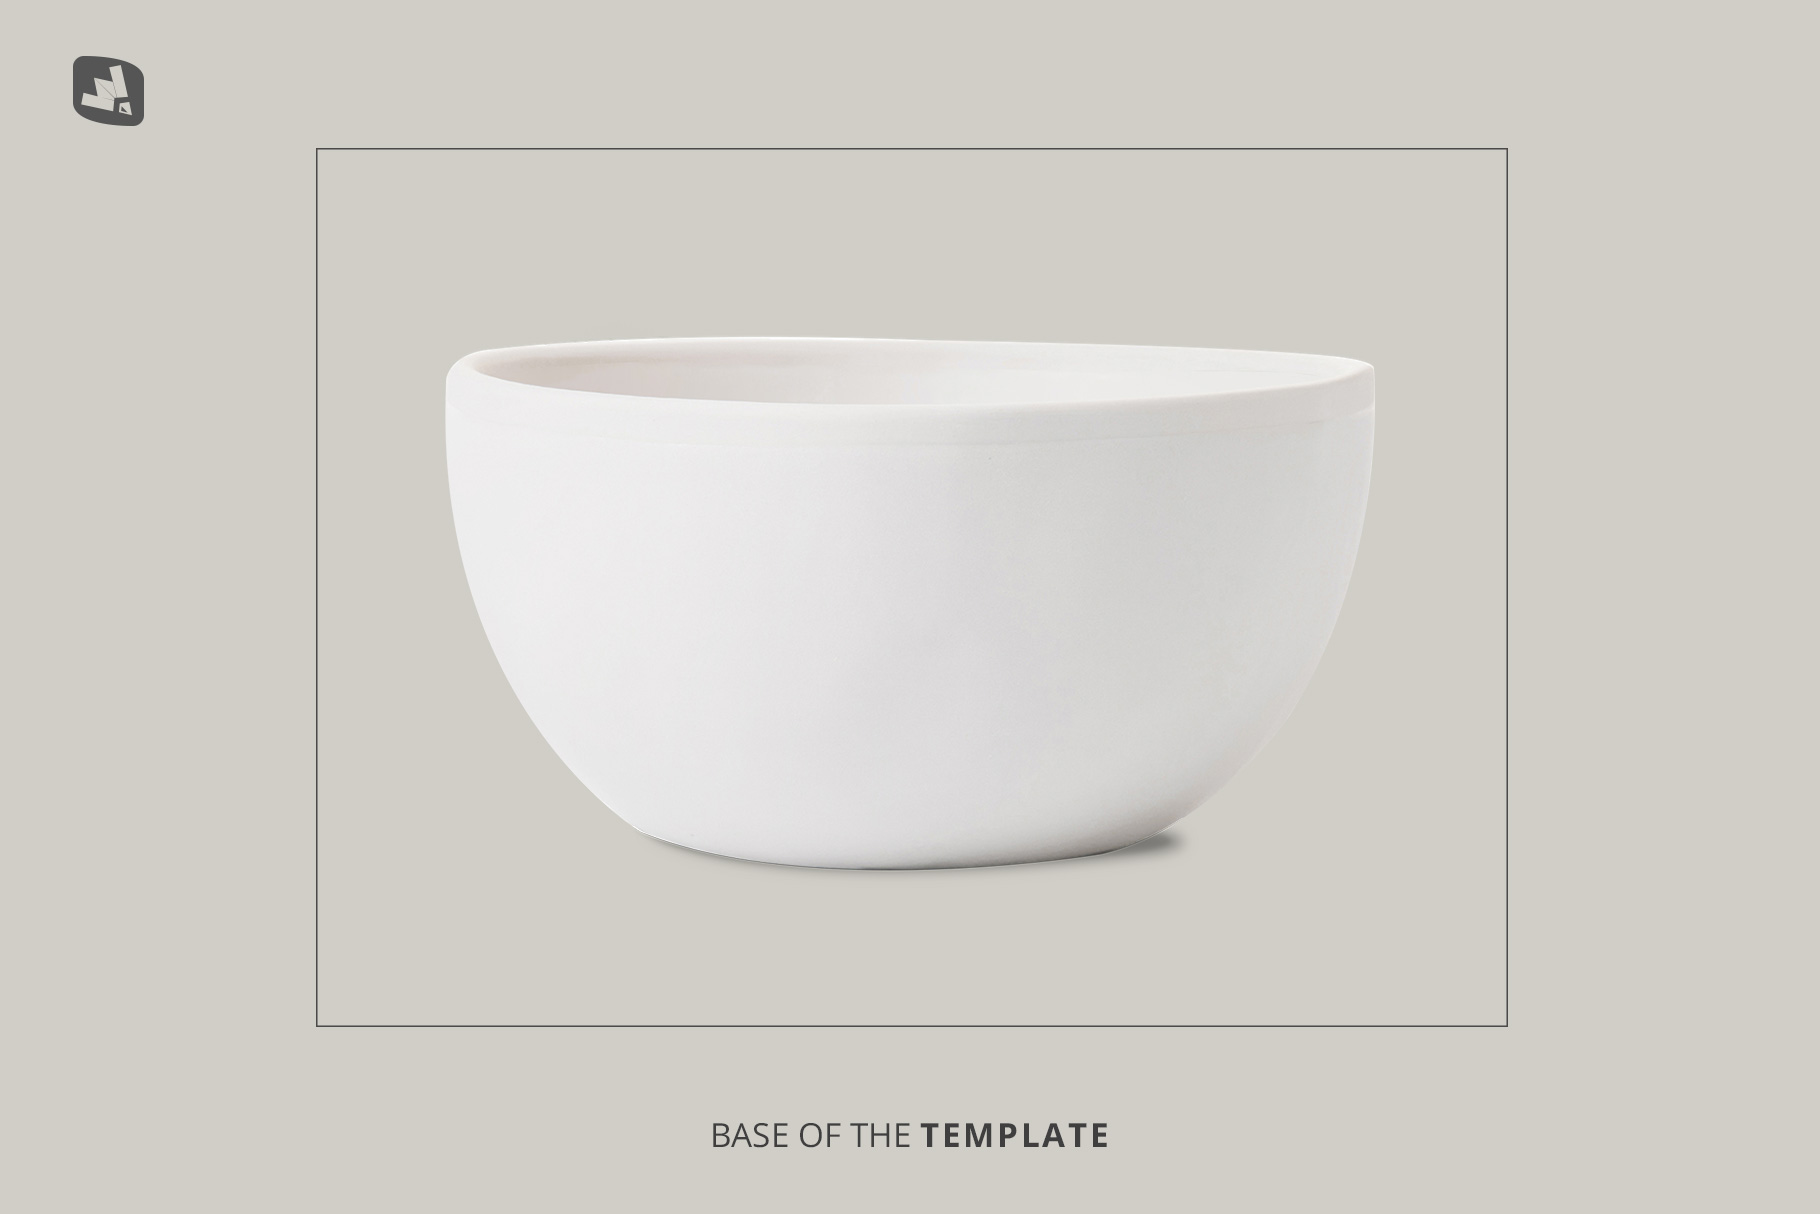 base image of the front view bowl mockup vol.1